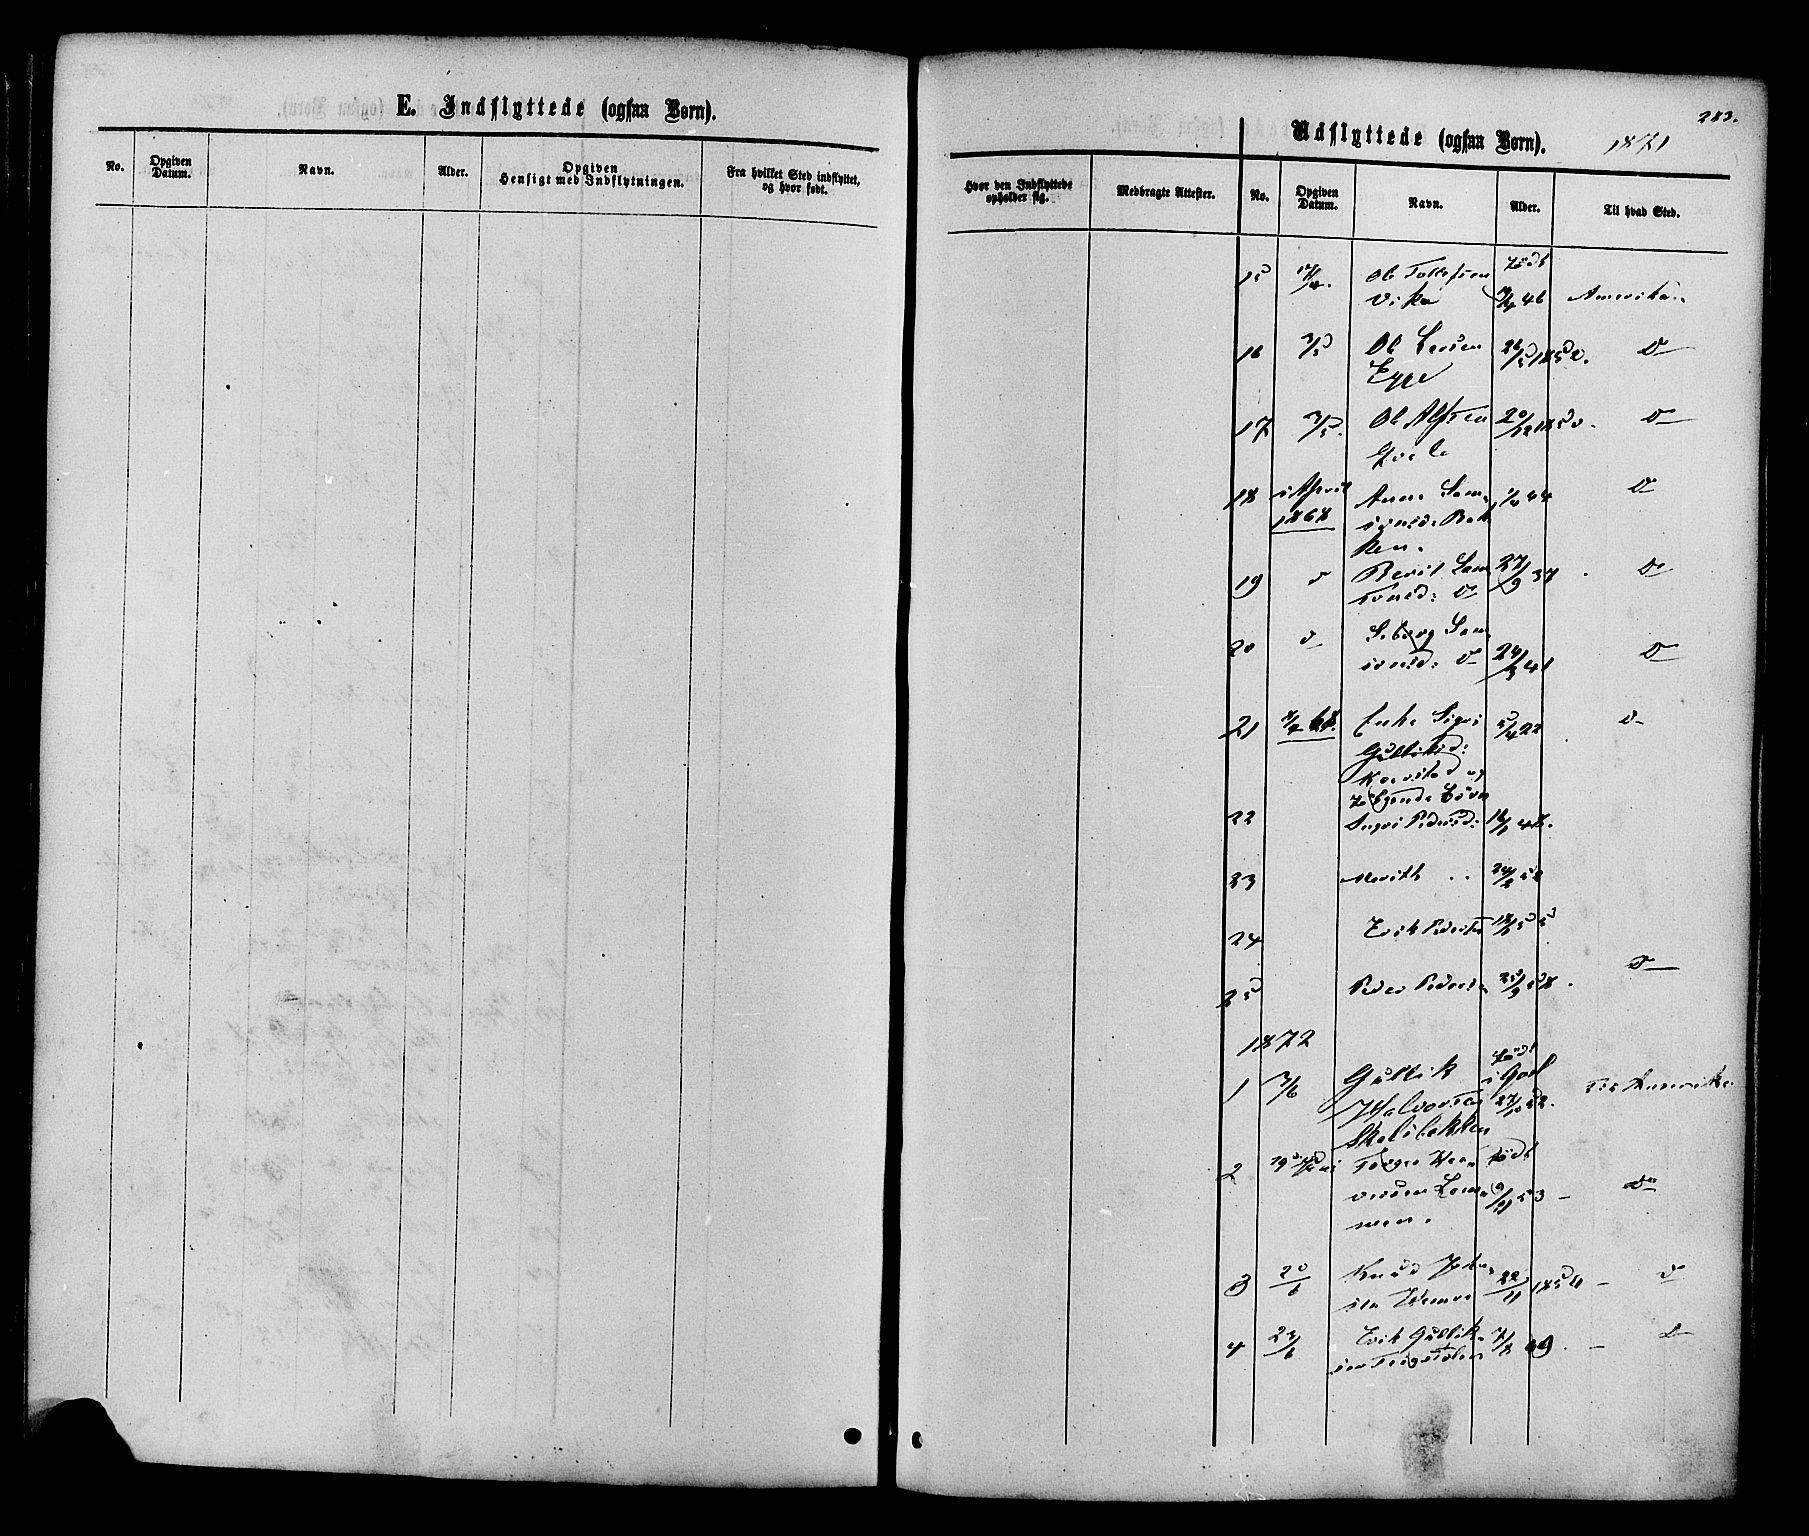 SAH, Vestre Slidre prestekontor, Ministerialbok nr. 3, 1865-1880, s. 283